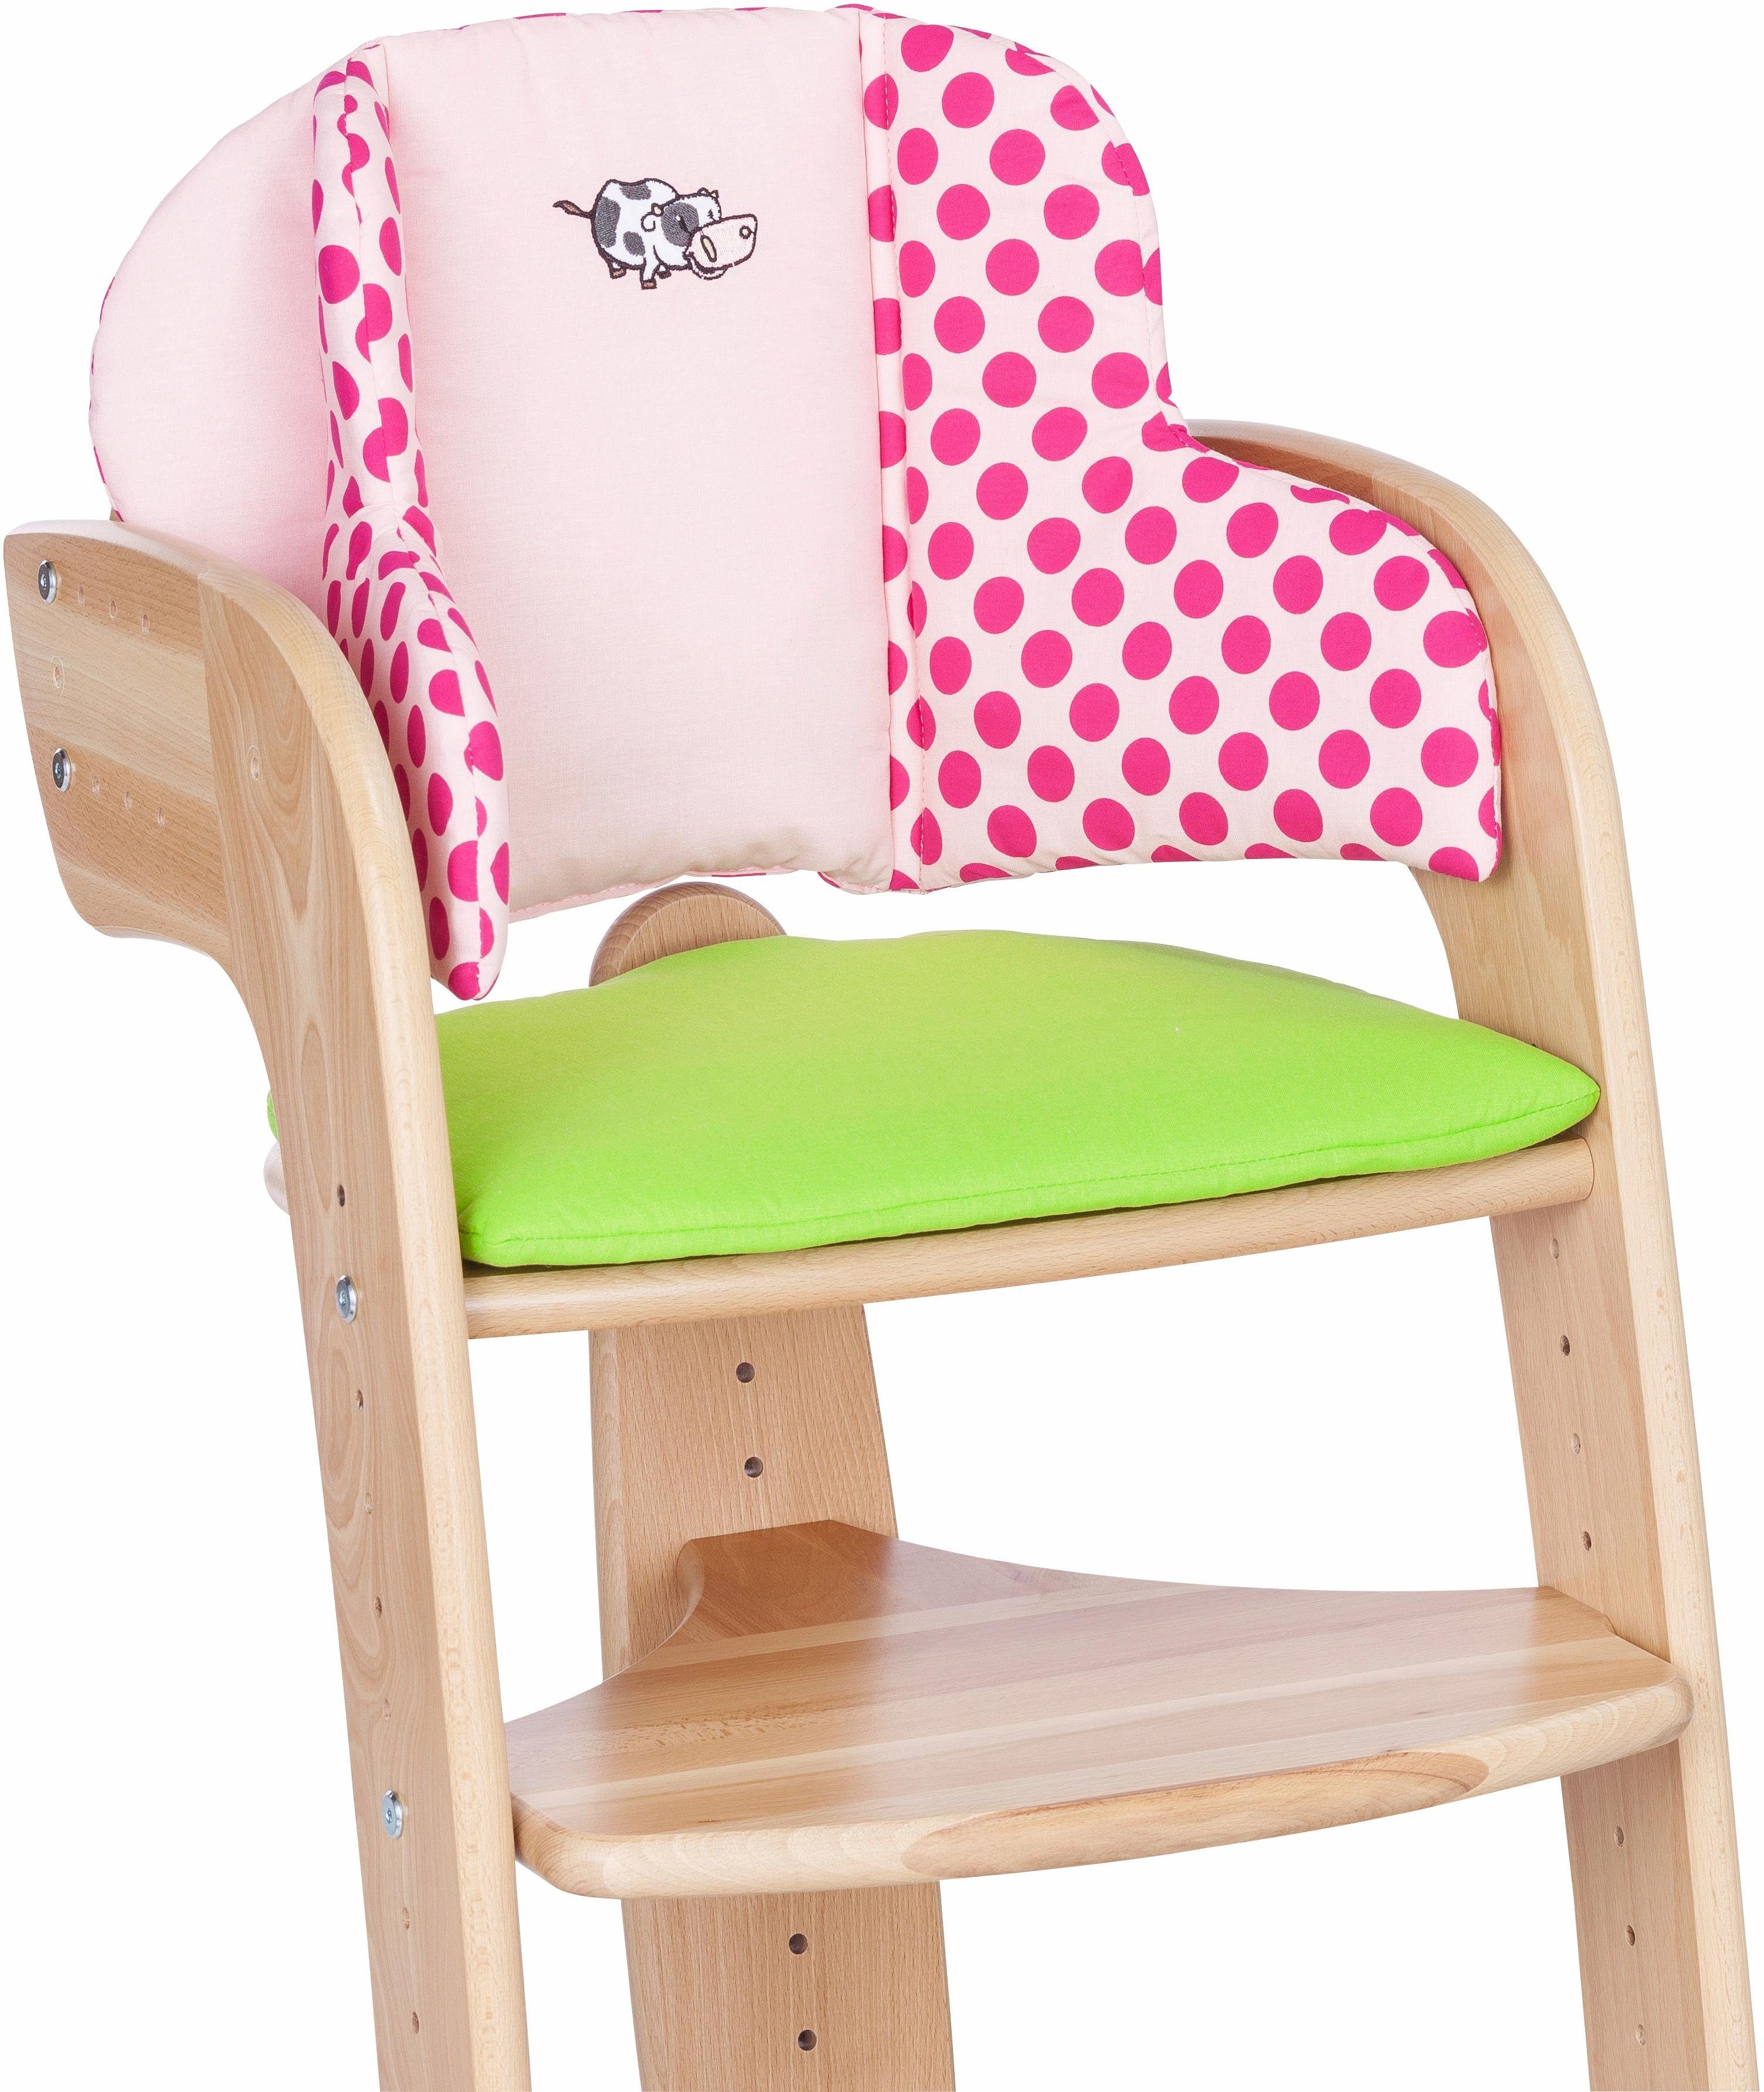 Herlag® Sitzpolster für Hochstuhl Tipp Topp Comfort IV, »Emma«